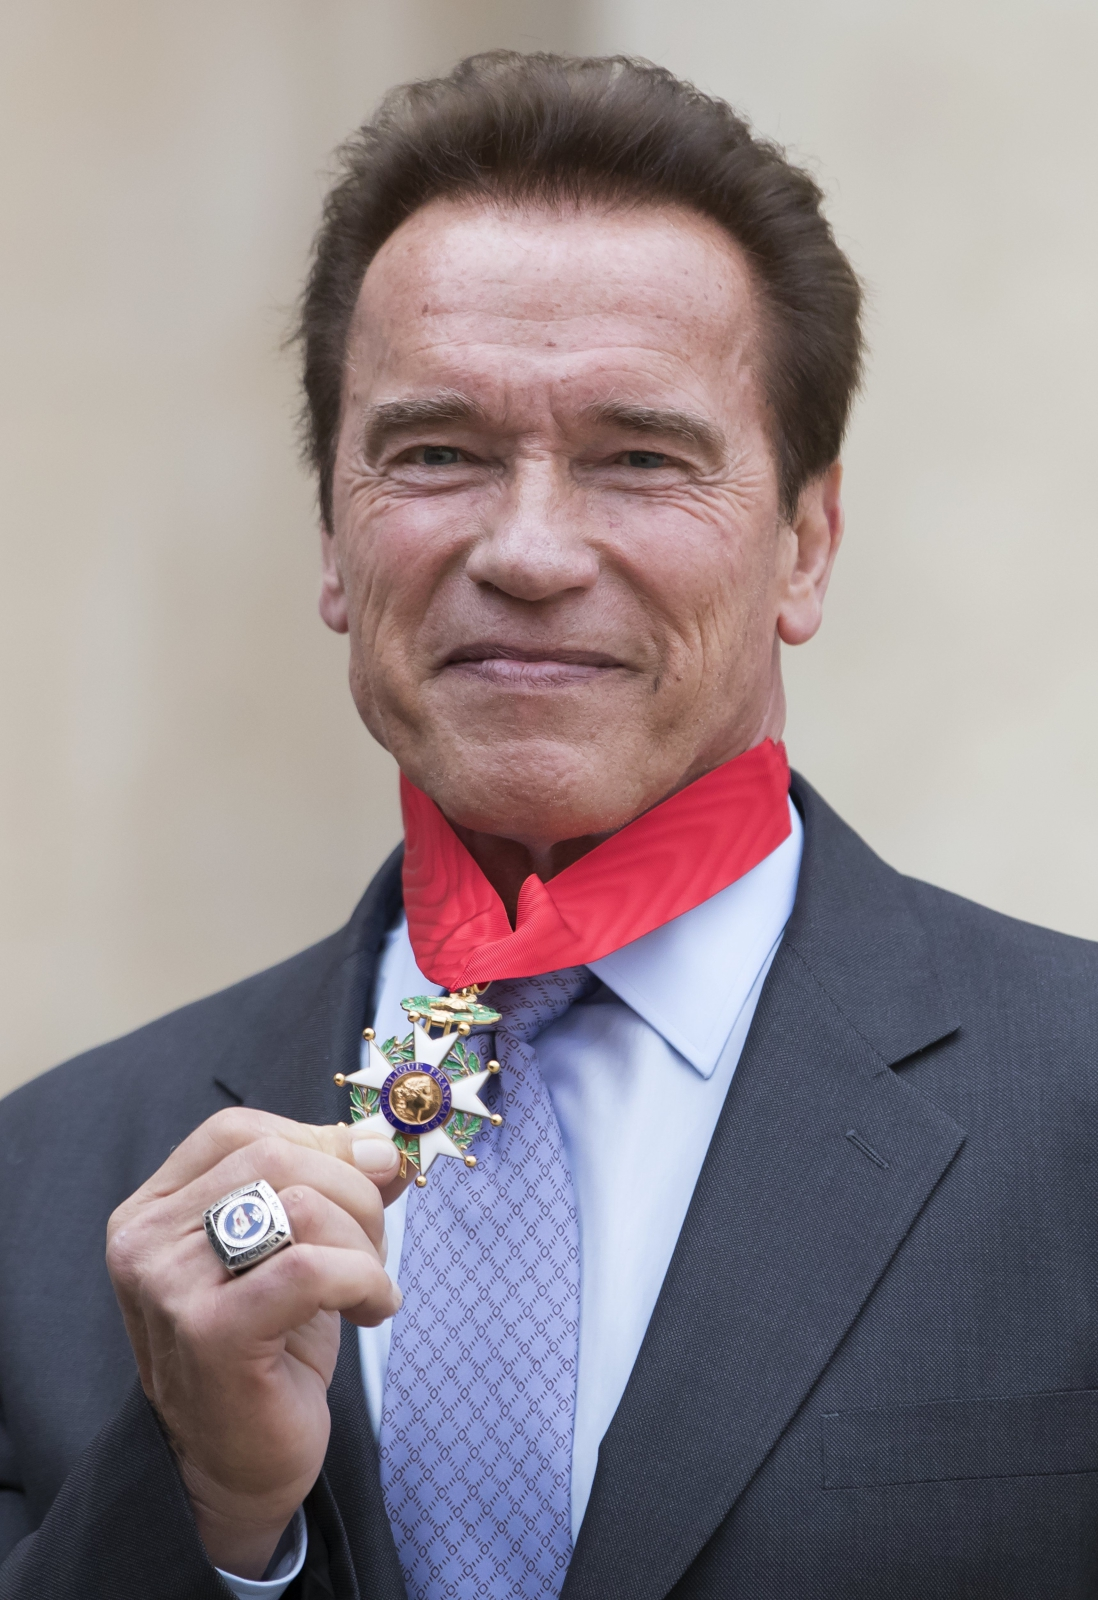 Arnold Schwarzenegger otrzymał medal Legionu Honorowego od francuskiego prezydenta Francois Hollande. Fot. PAP/ EPA/IAN LANGSDON